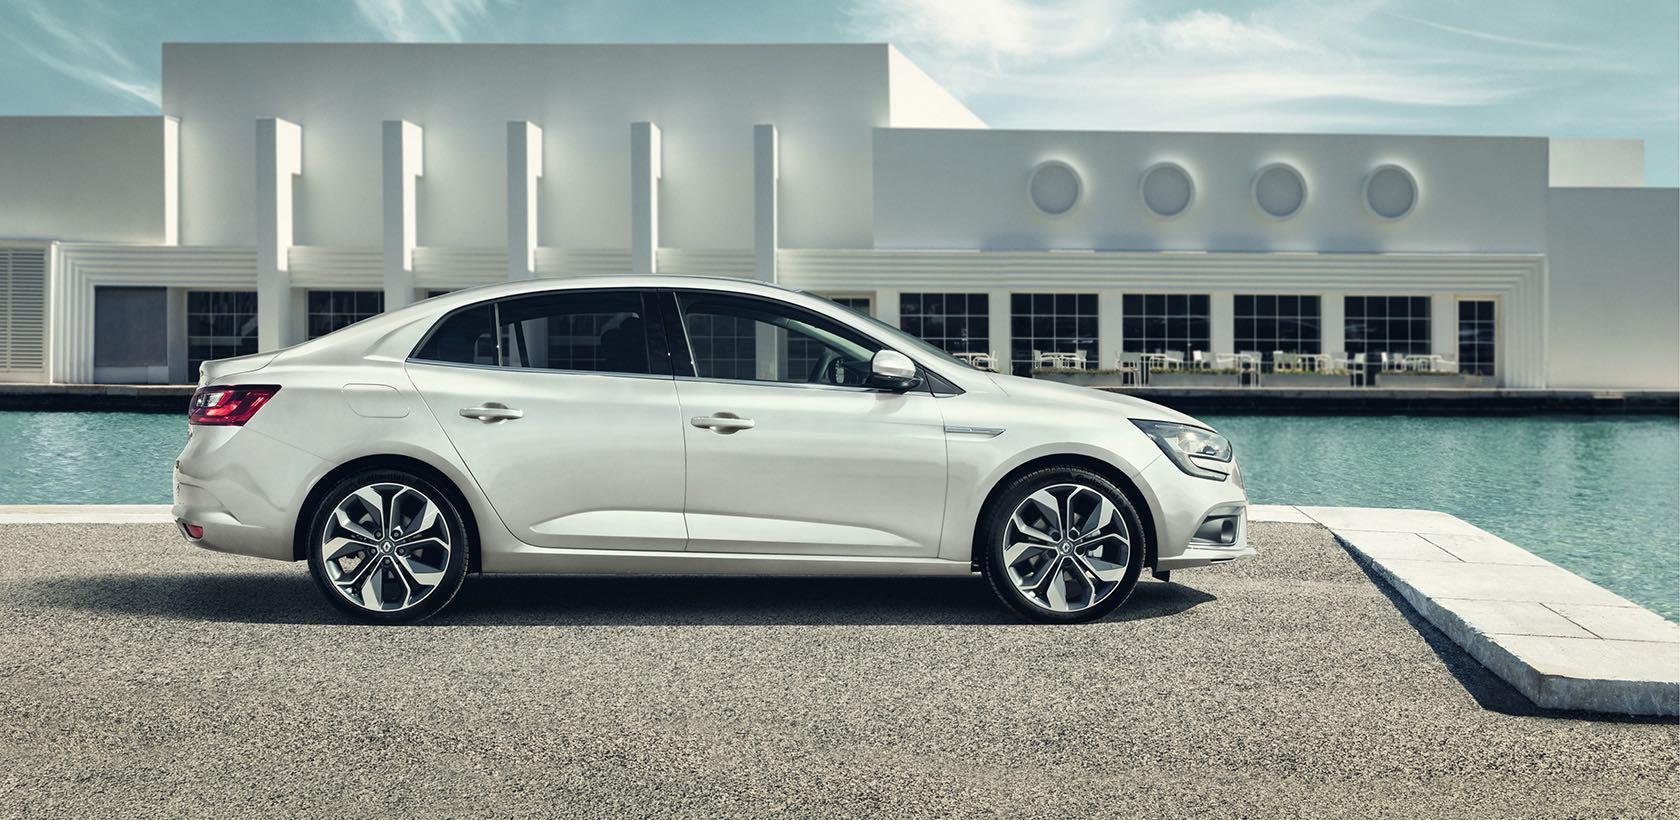 Nouvelle Renault Megane Sedan